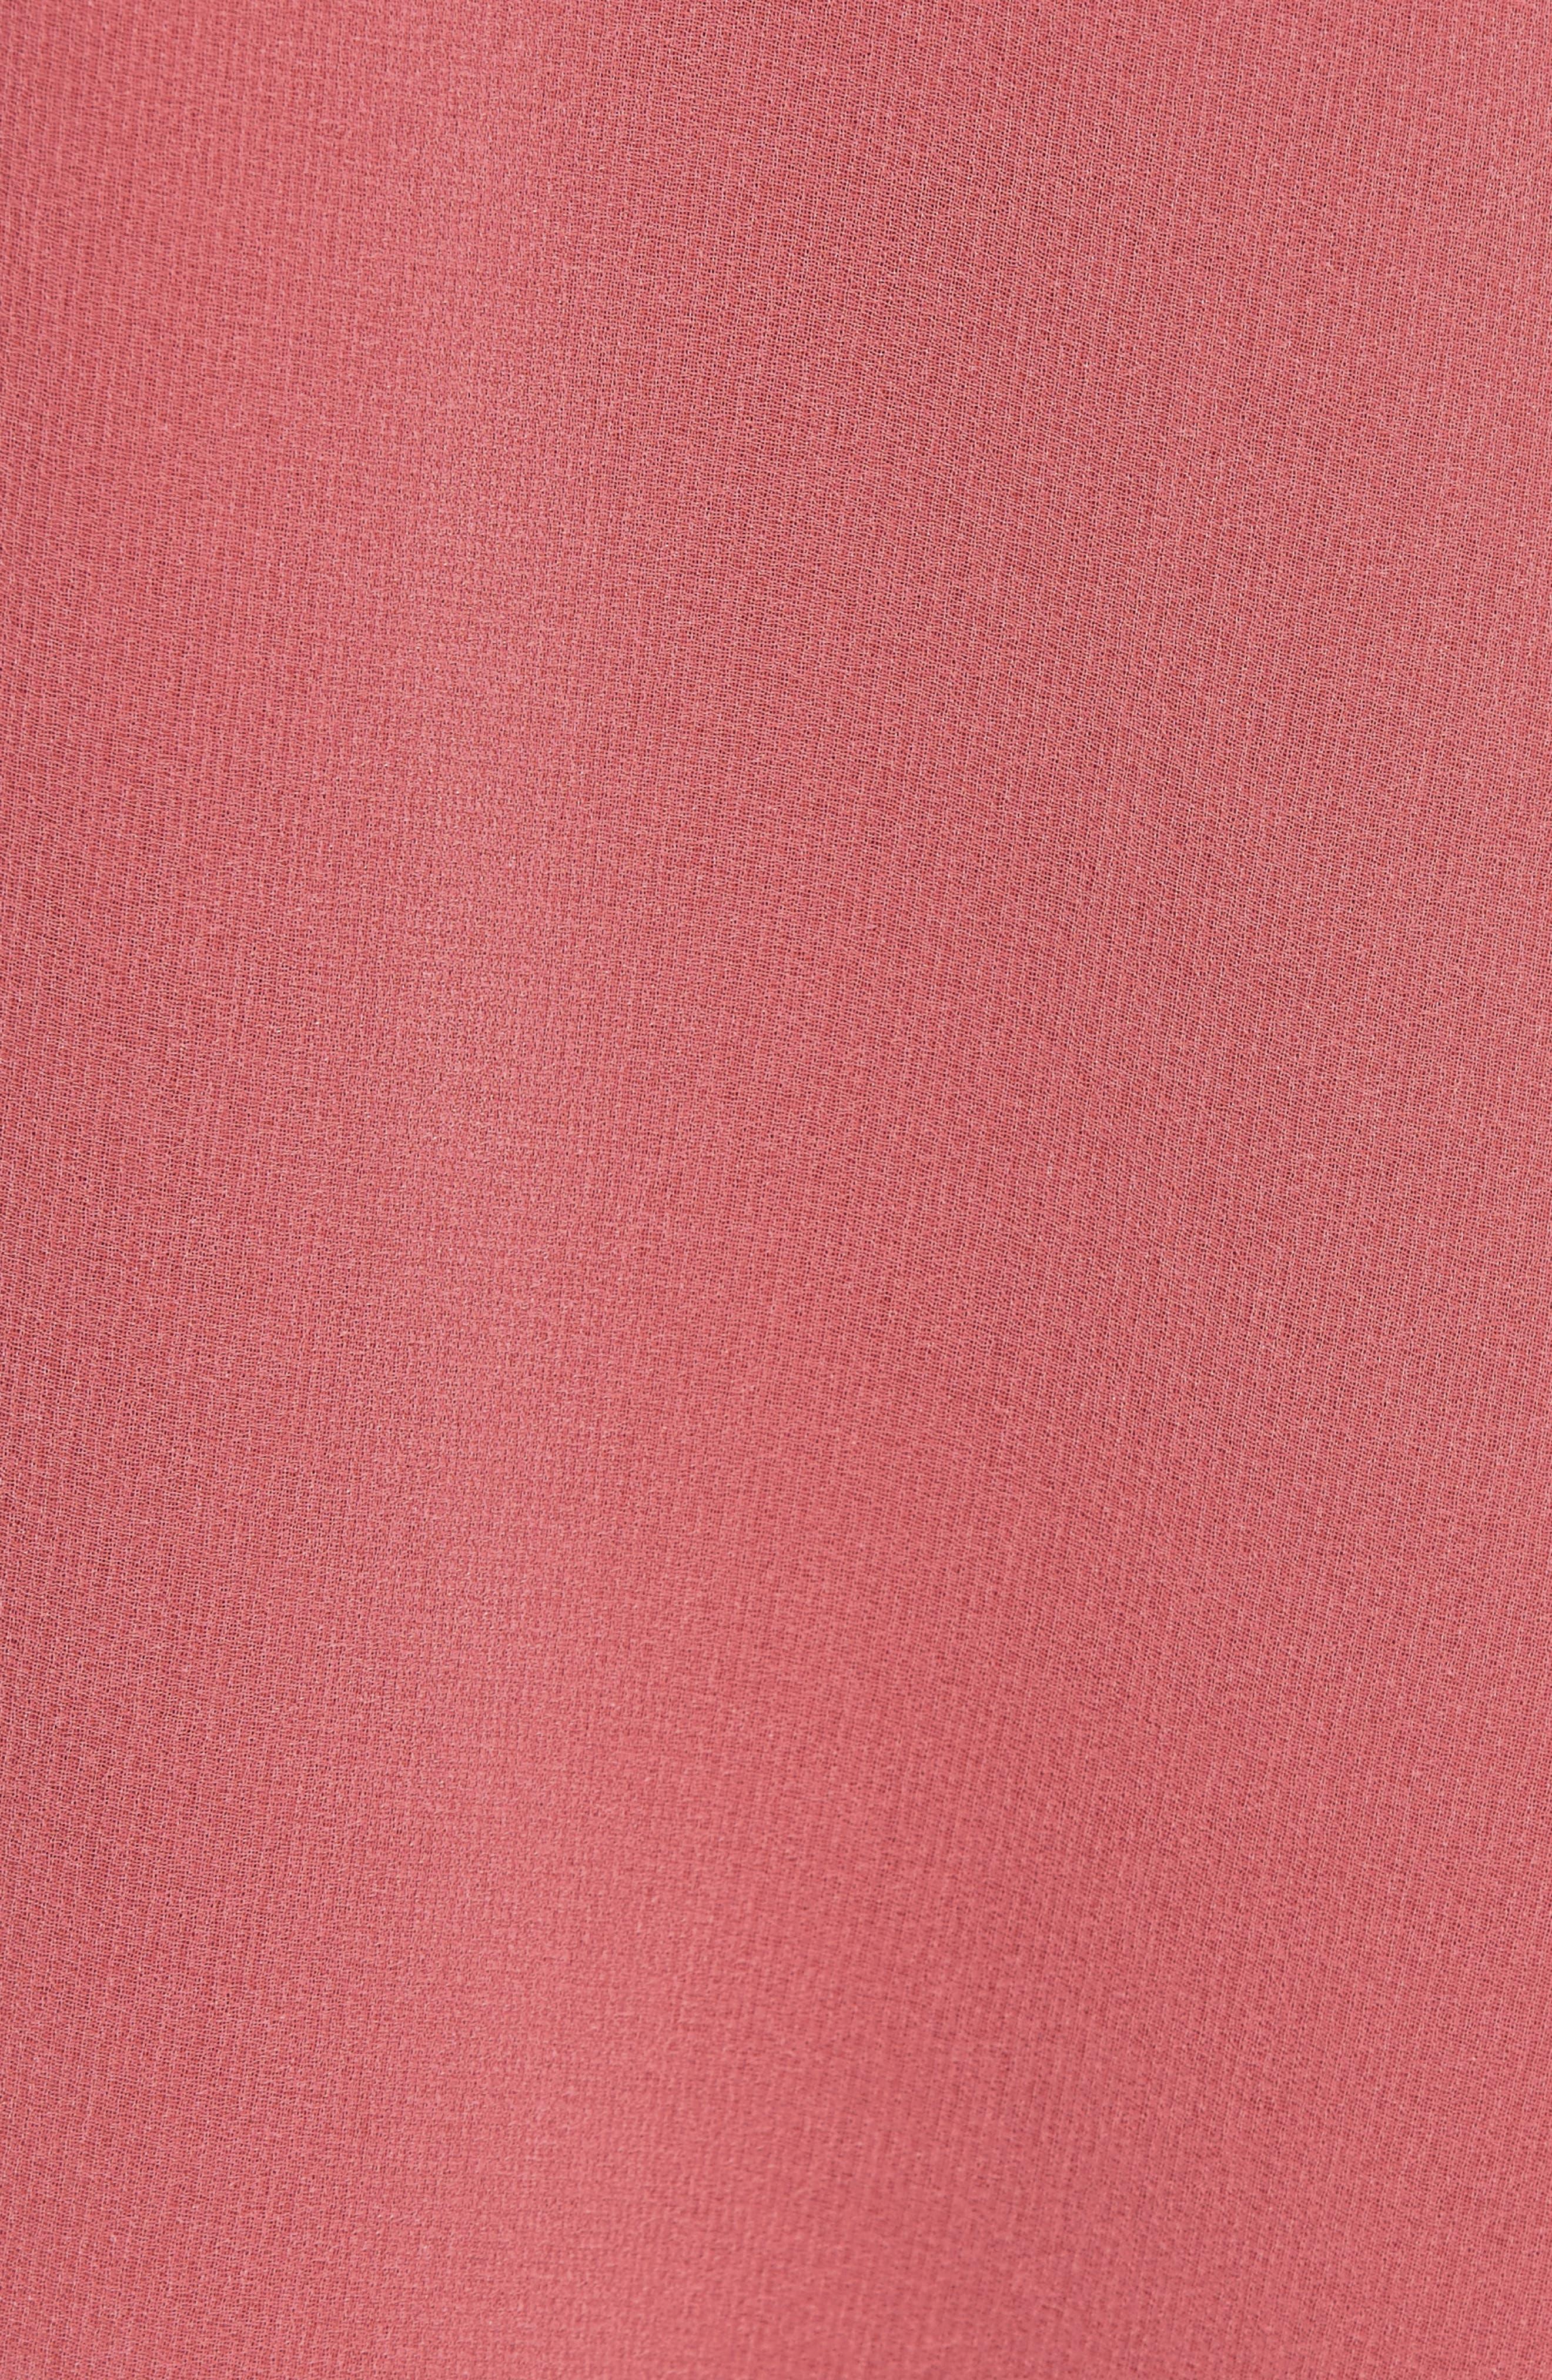 Night Lights Ruffle Dress,                             Alternate thumbnail 6, color,                             800